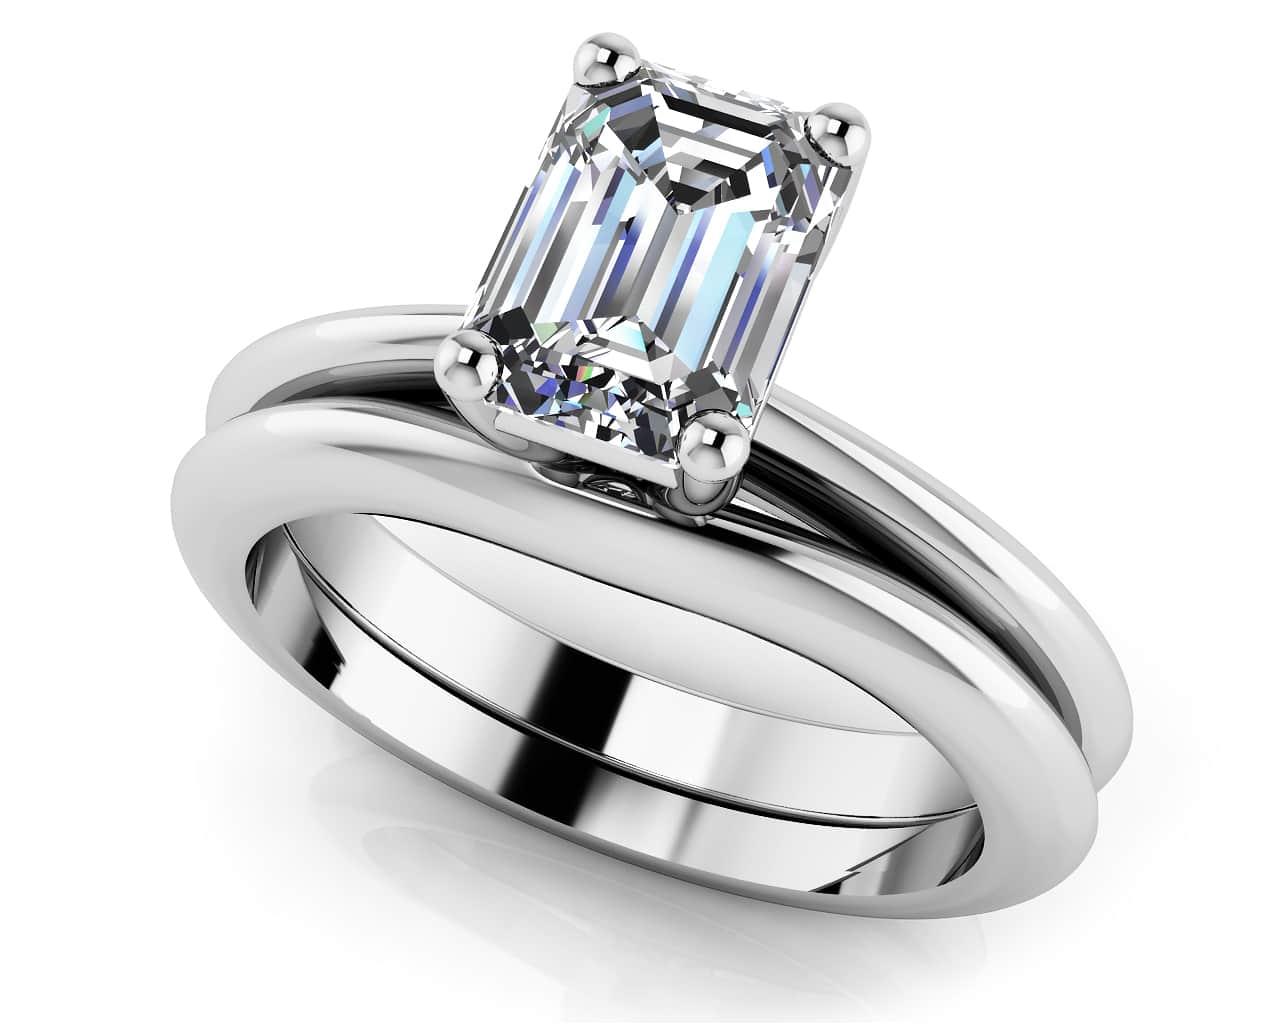 1 55 Heart Irish Celtic Pink Stone Promise Bridal Wedding Ring 14k